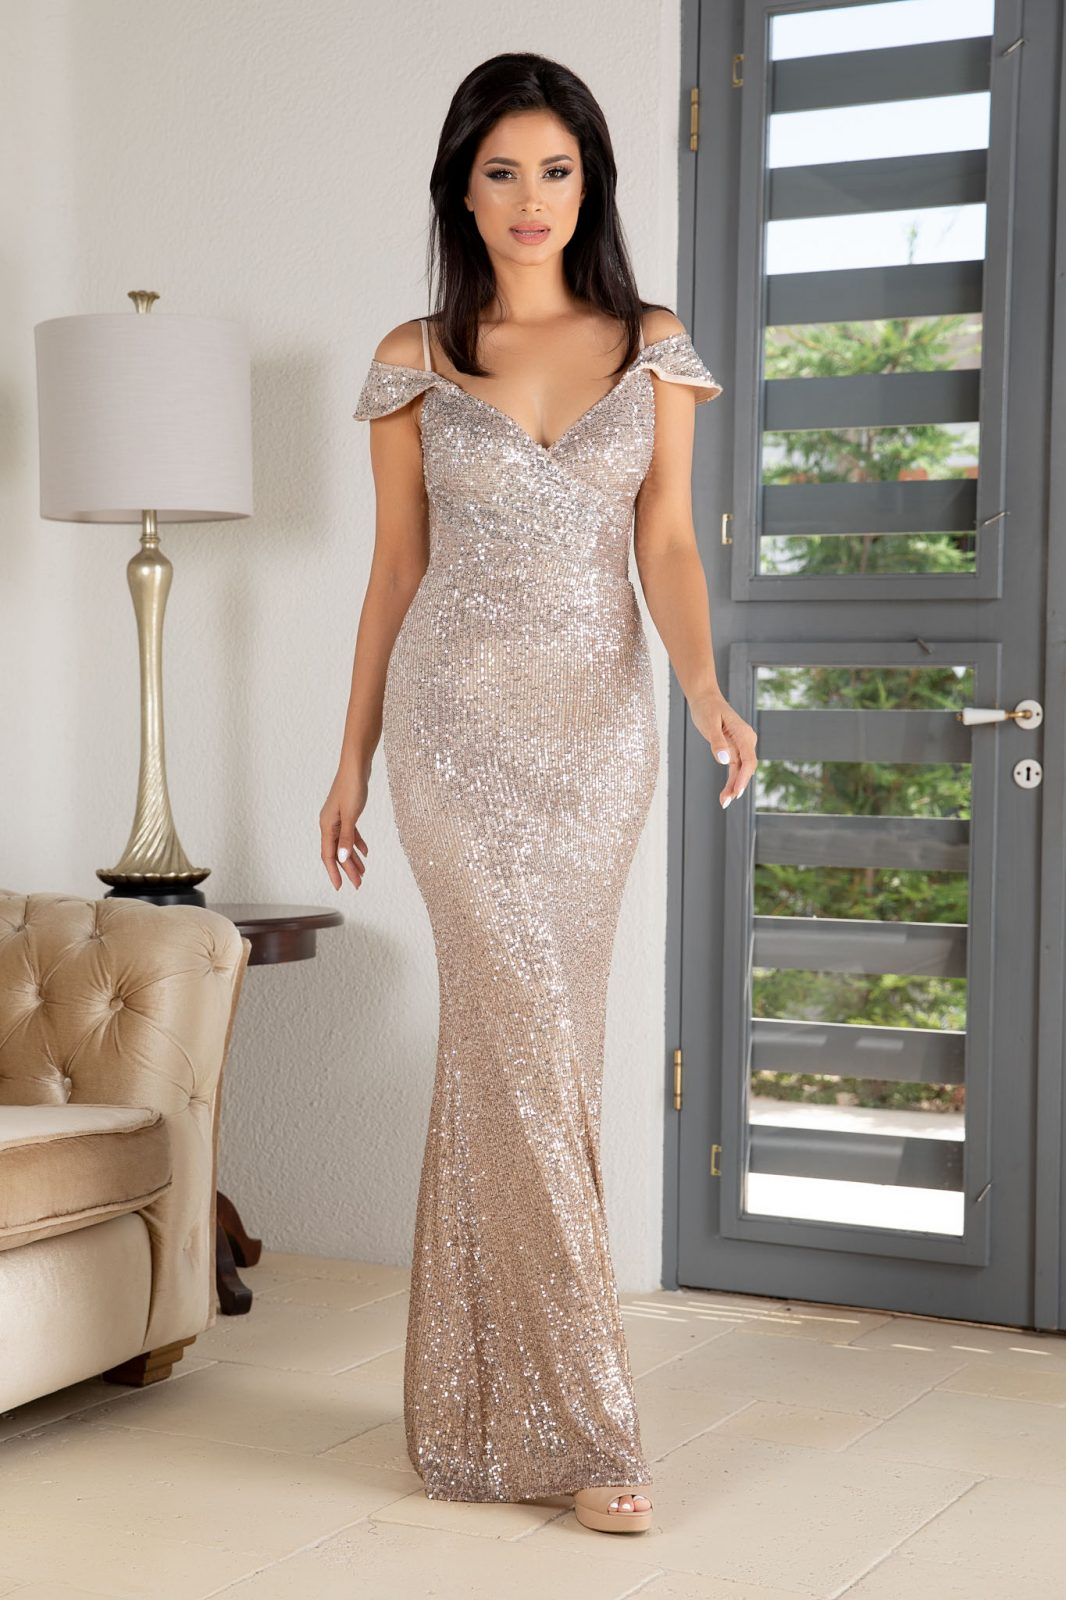 Sensual Nude Φόρεμα 4872